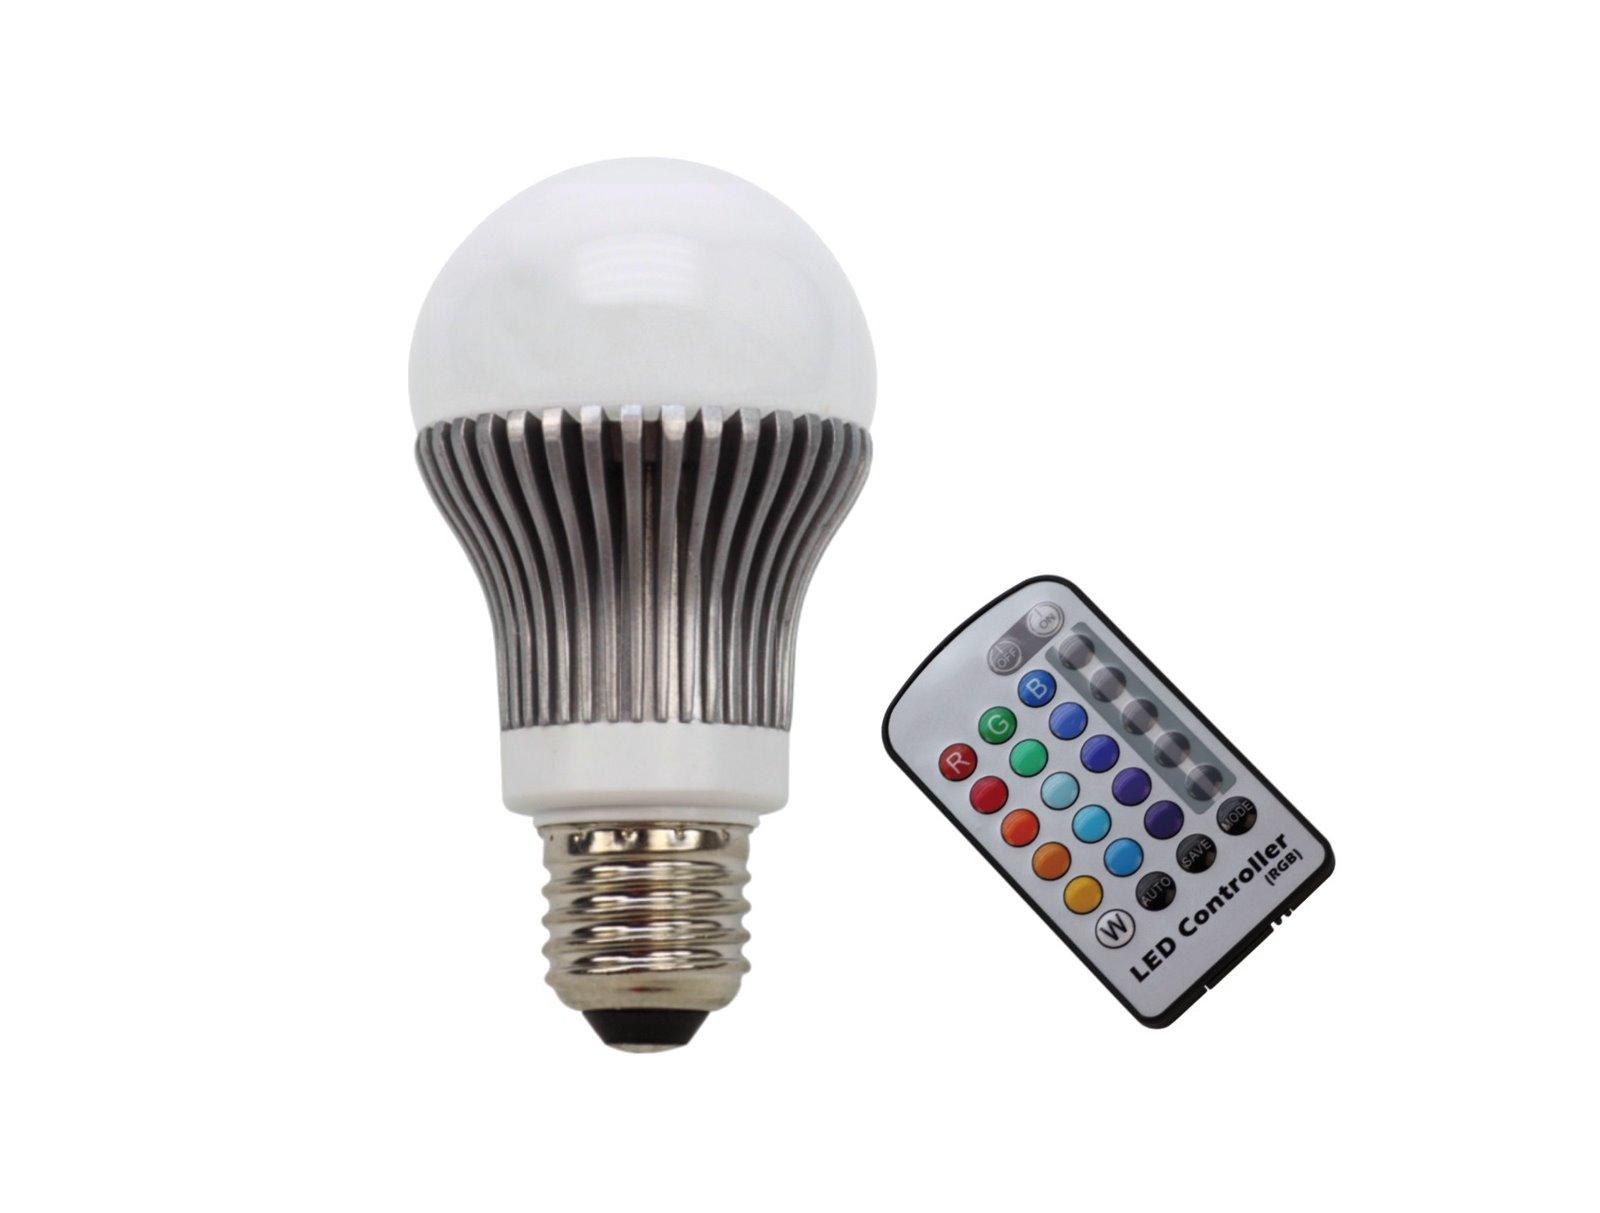 5w power led birne rgb licht lampe fernbedienung farbwechsel e27 kugel remote ebay. Black Bedroom Furniture Sets. Home Design Ideas